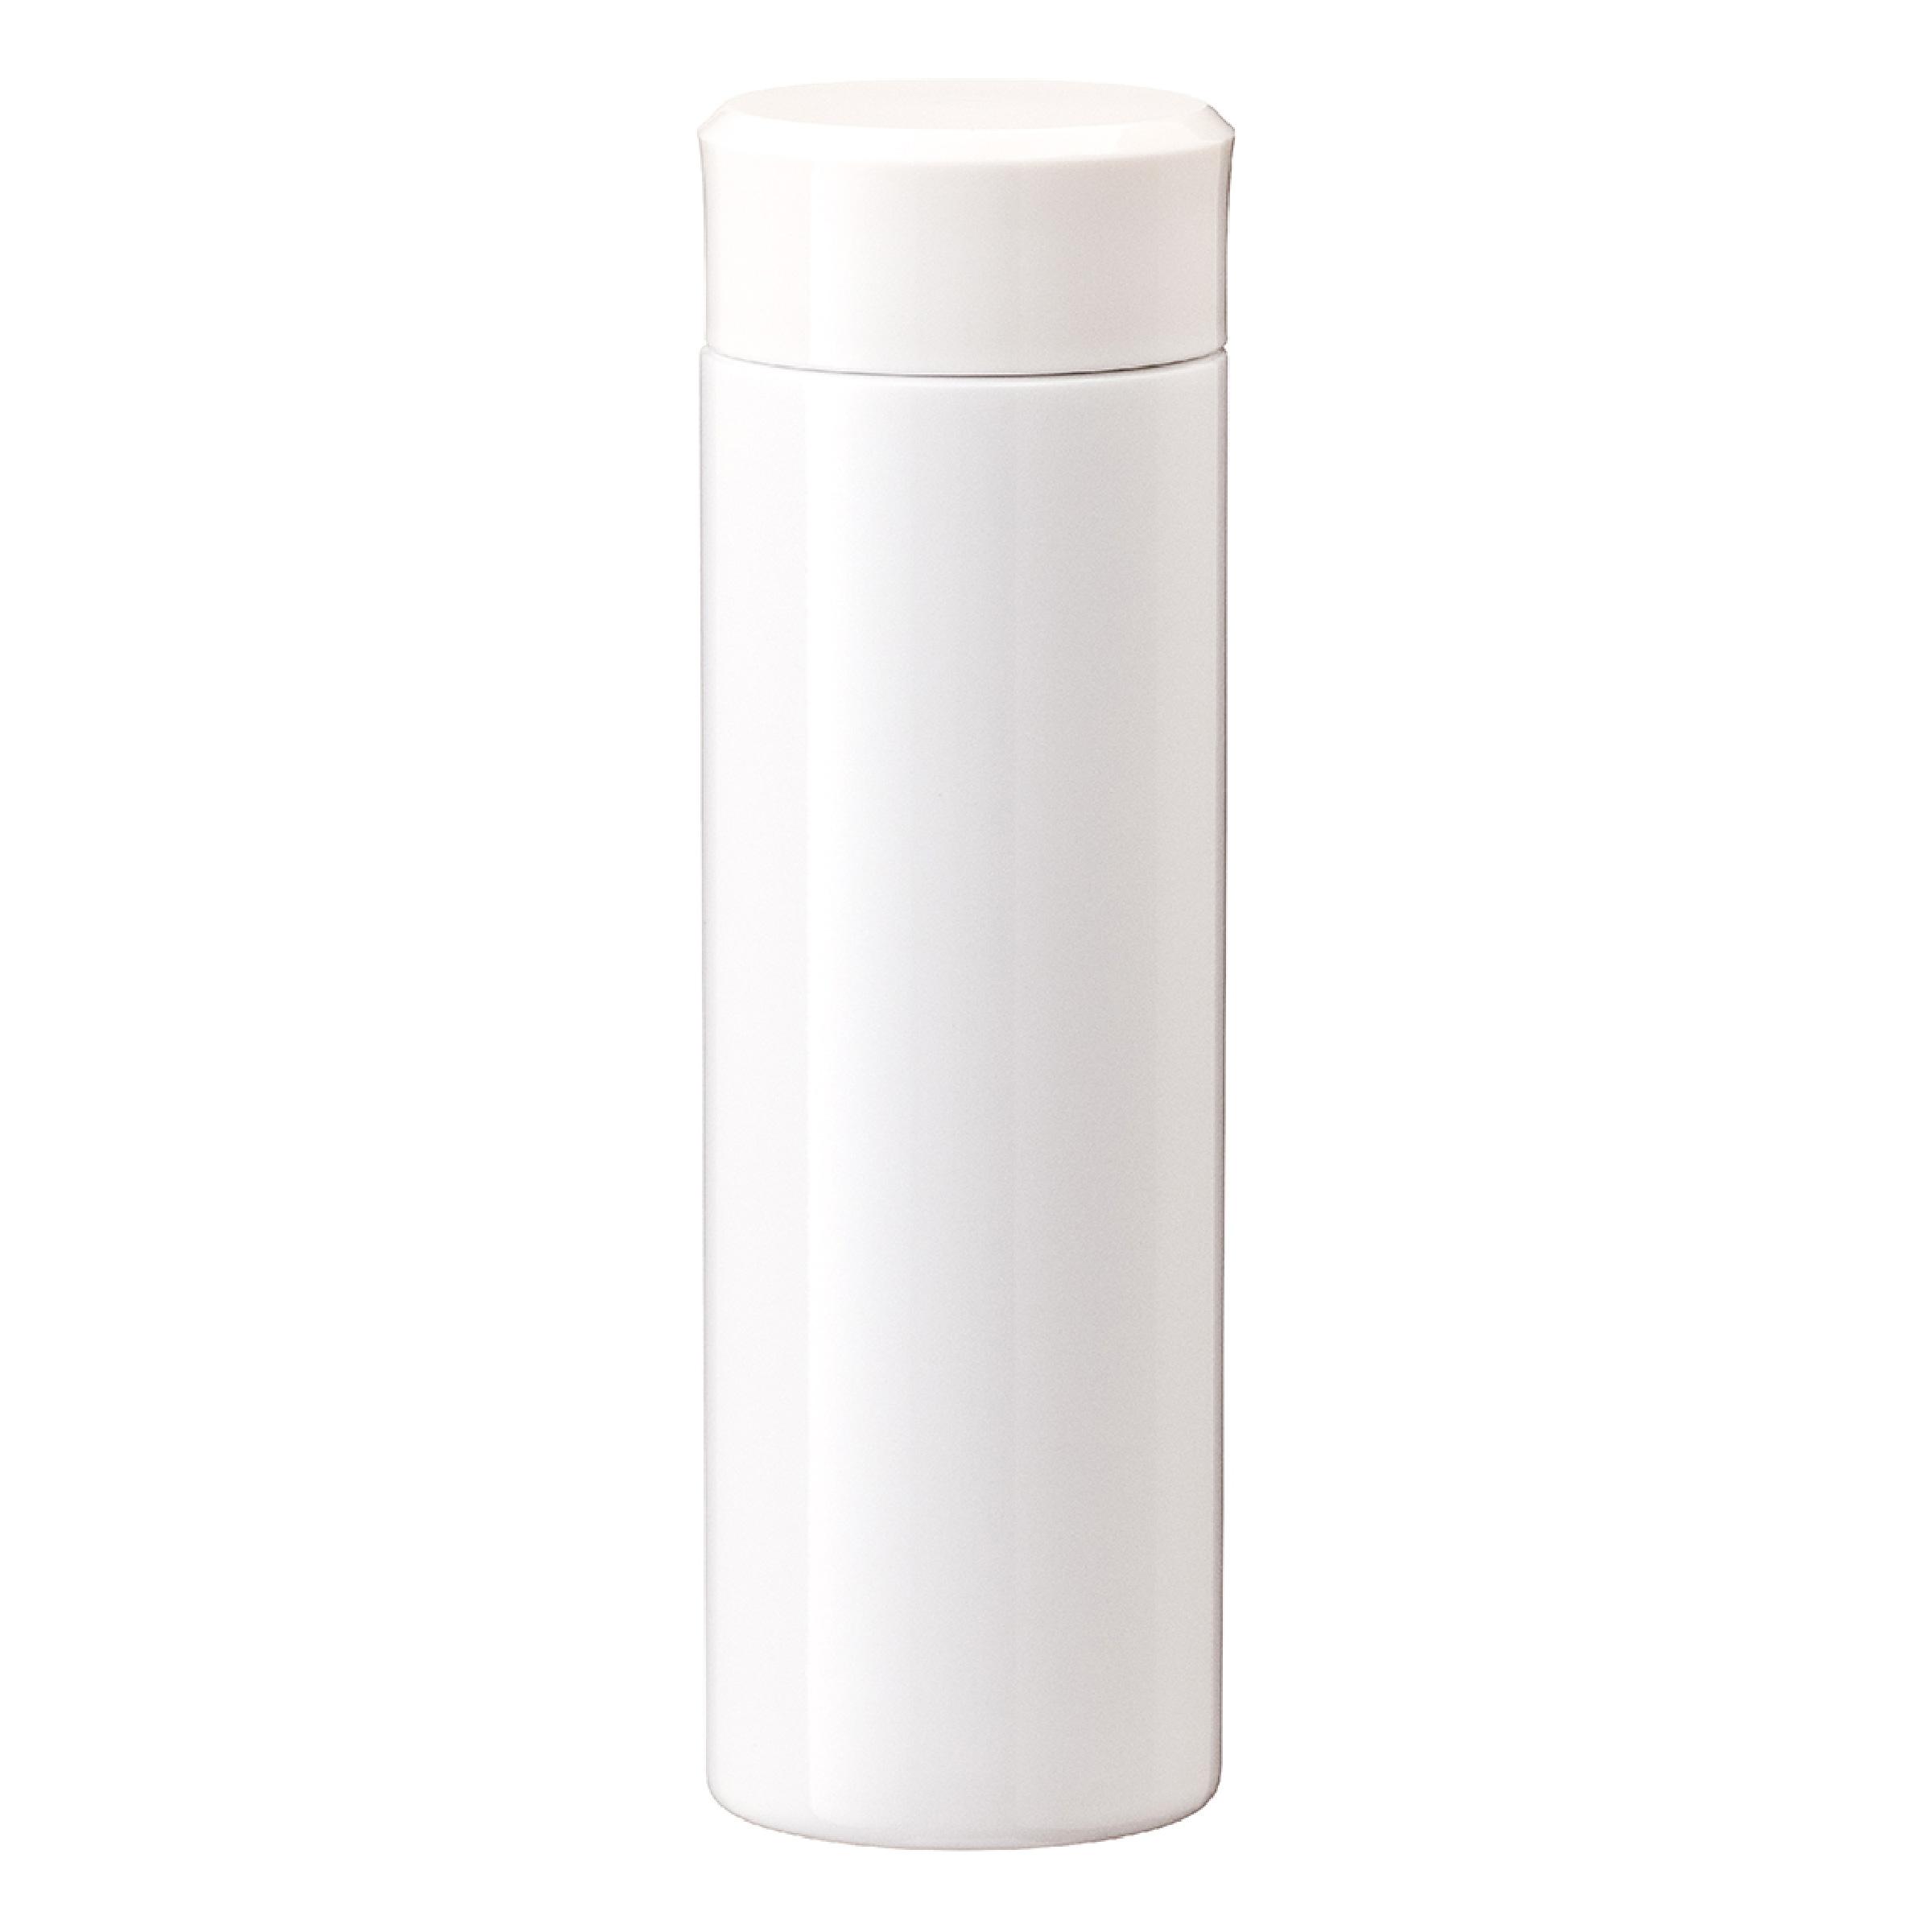 Airlist 超軽量マグボトル 500ml ホワイト